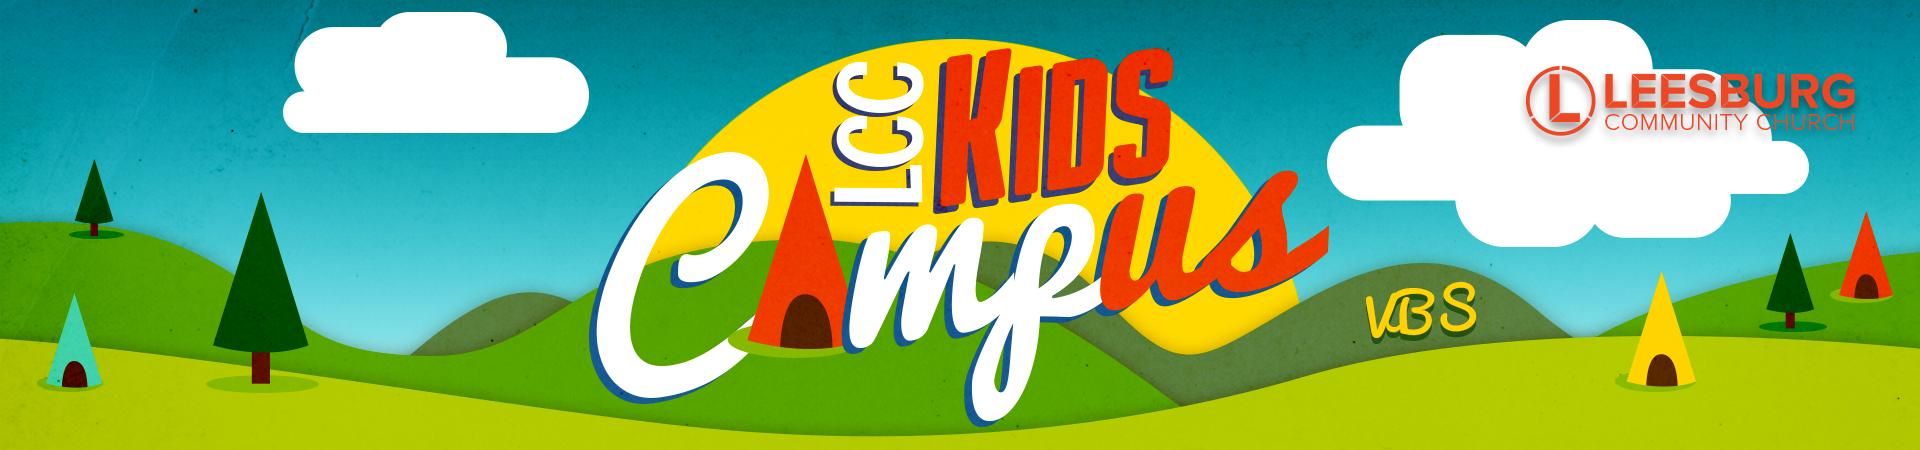 Kids Campus Banner.png